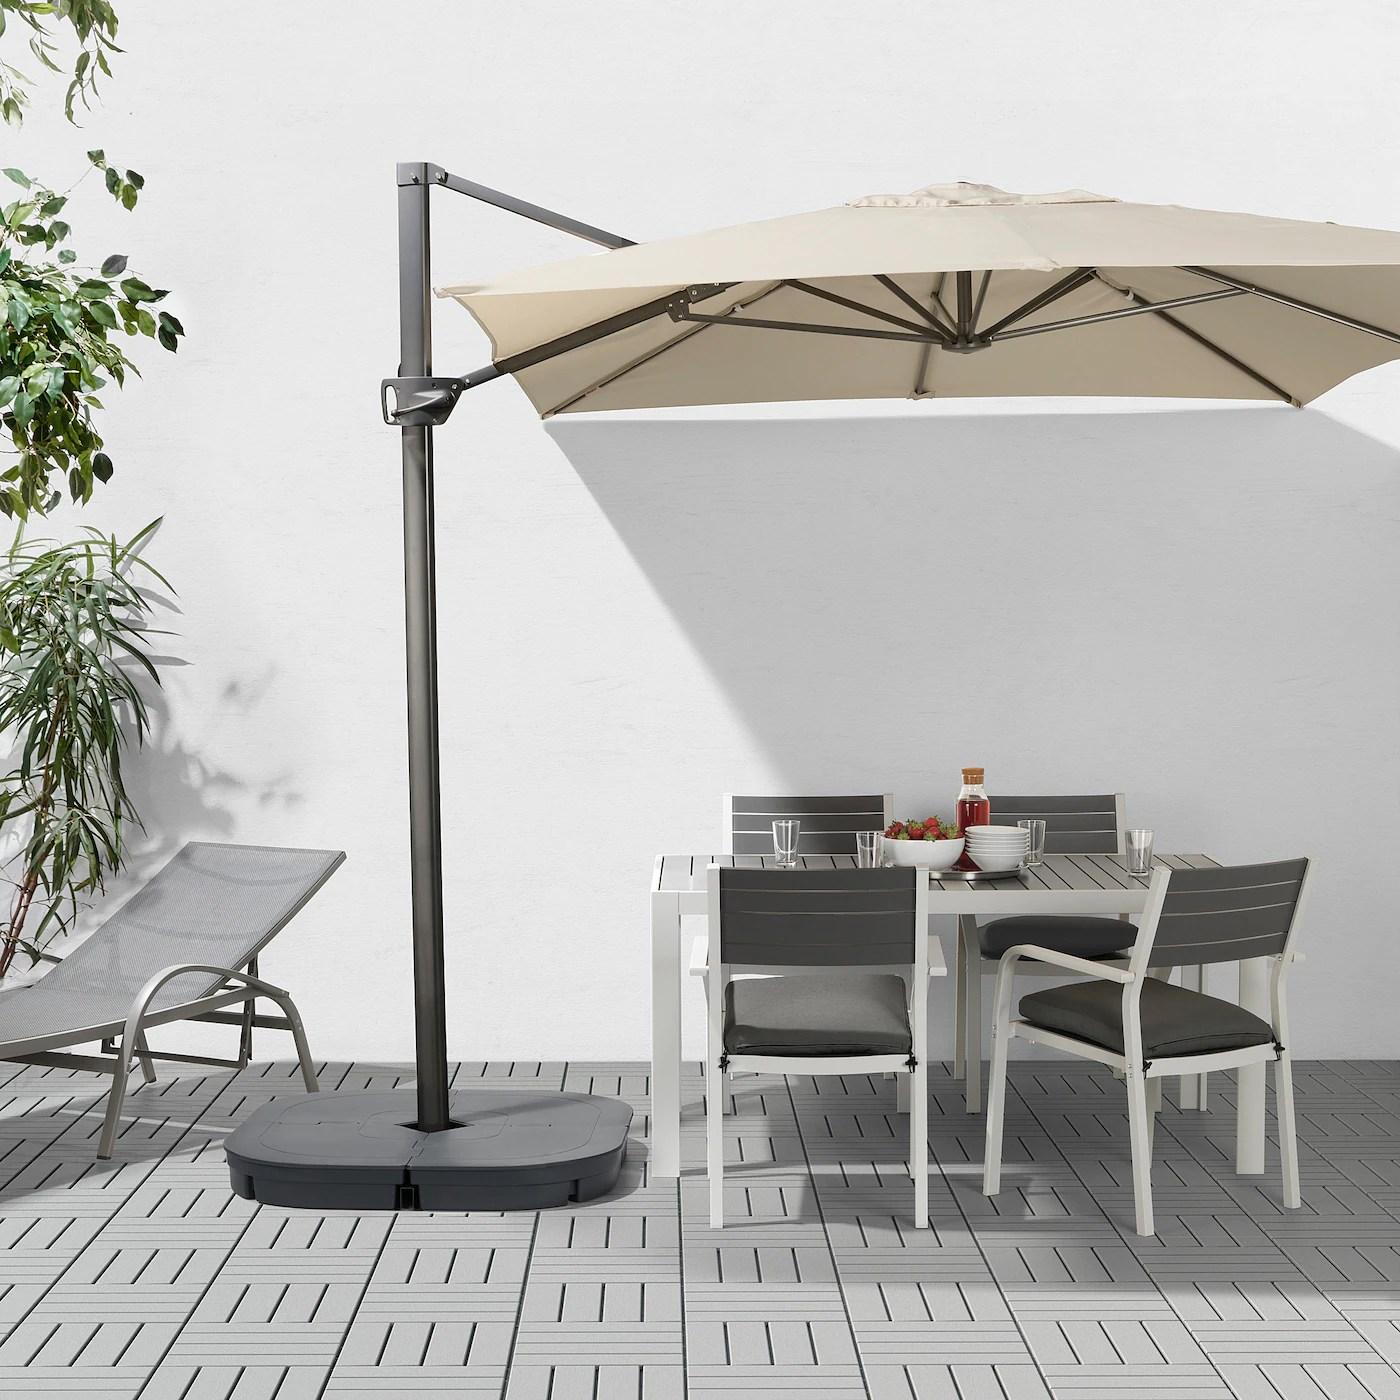 seglaro svarto hanging umbrella with base tilting beige dark gray 129 7 8x94 1 2